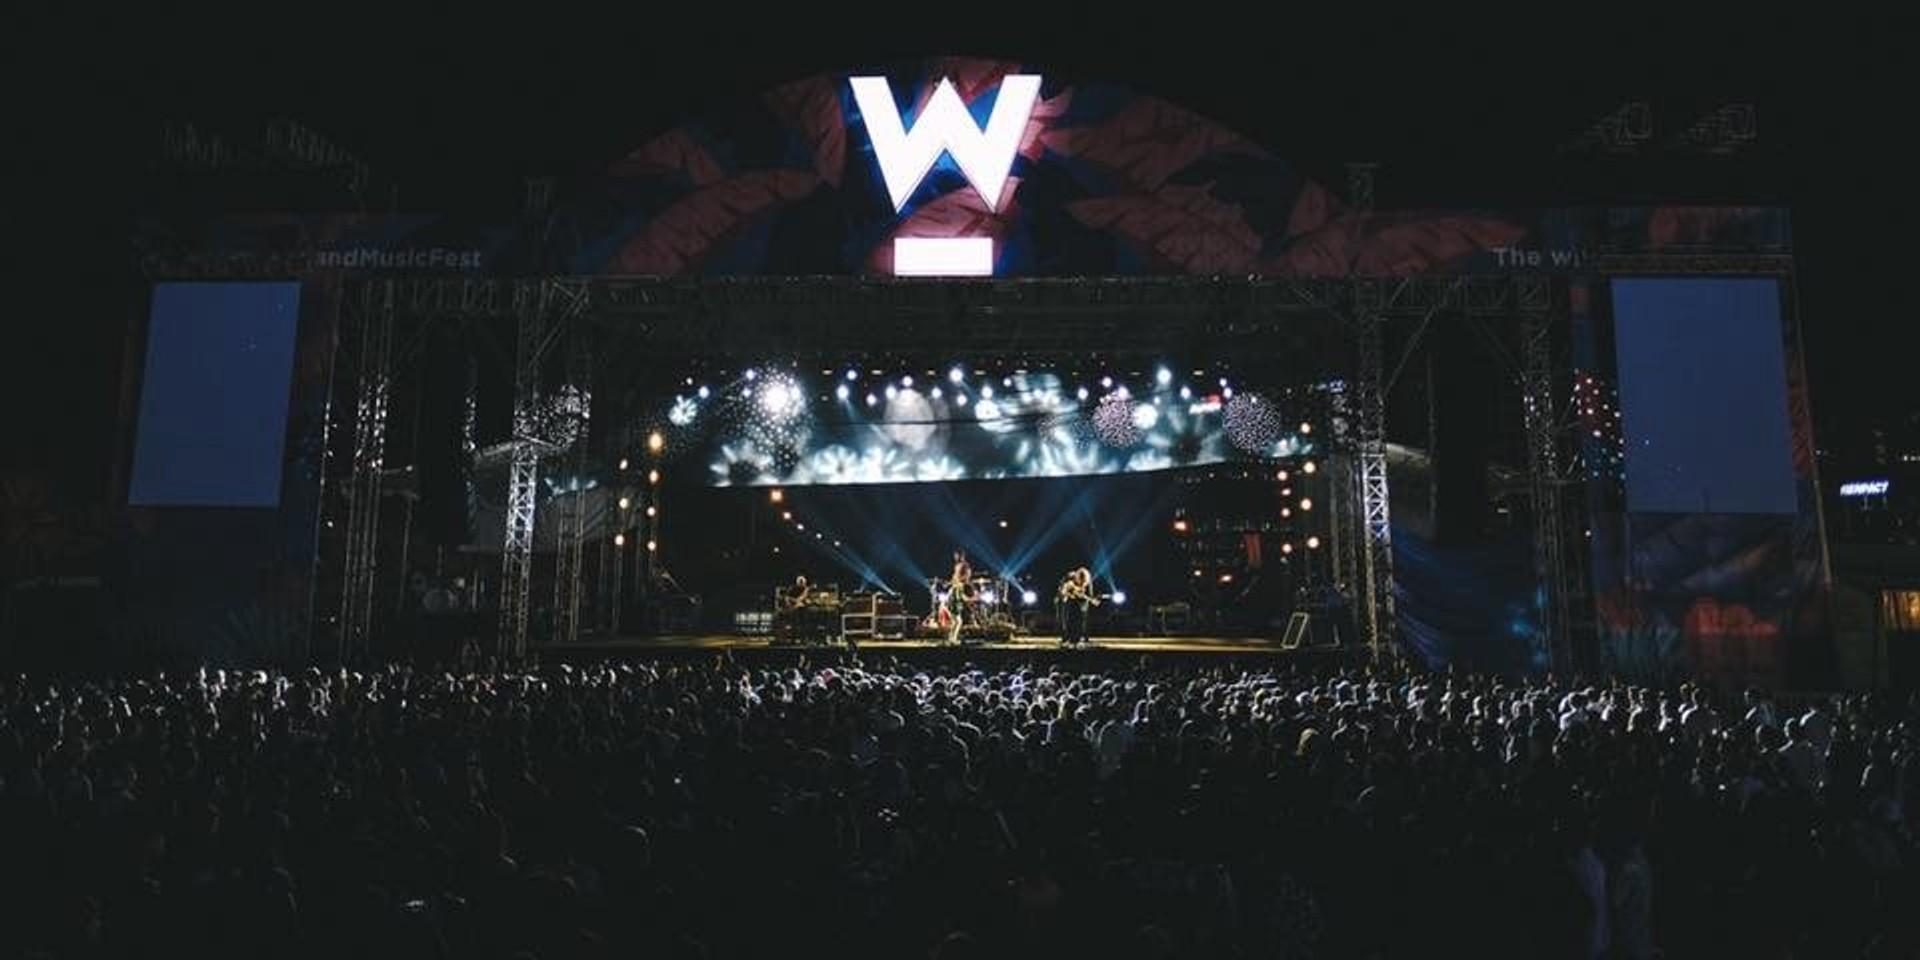 Karpos Multimedia talks Wanderland 2017 challenges, 5 years in the festival business